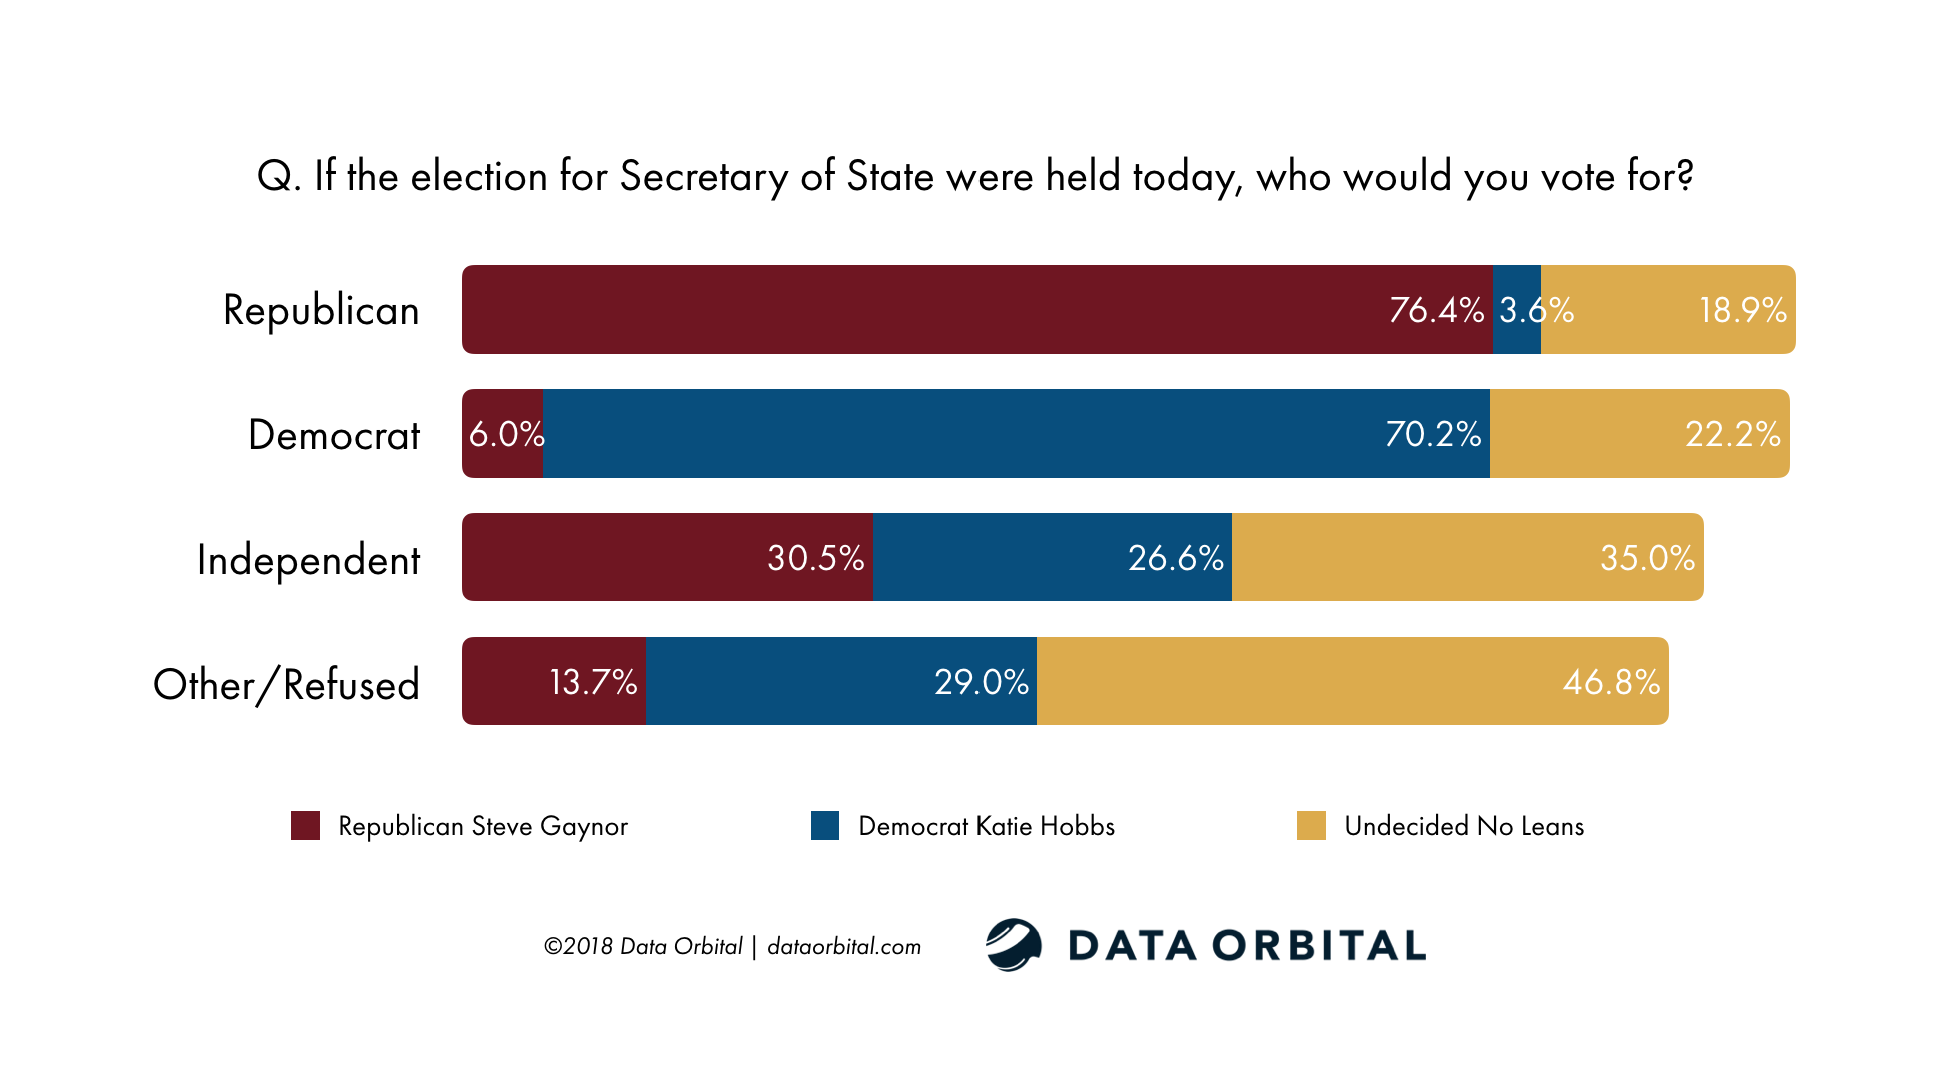 AZ Statewide Survey October 2018 Data Orbital Secretary of State Race by Party